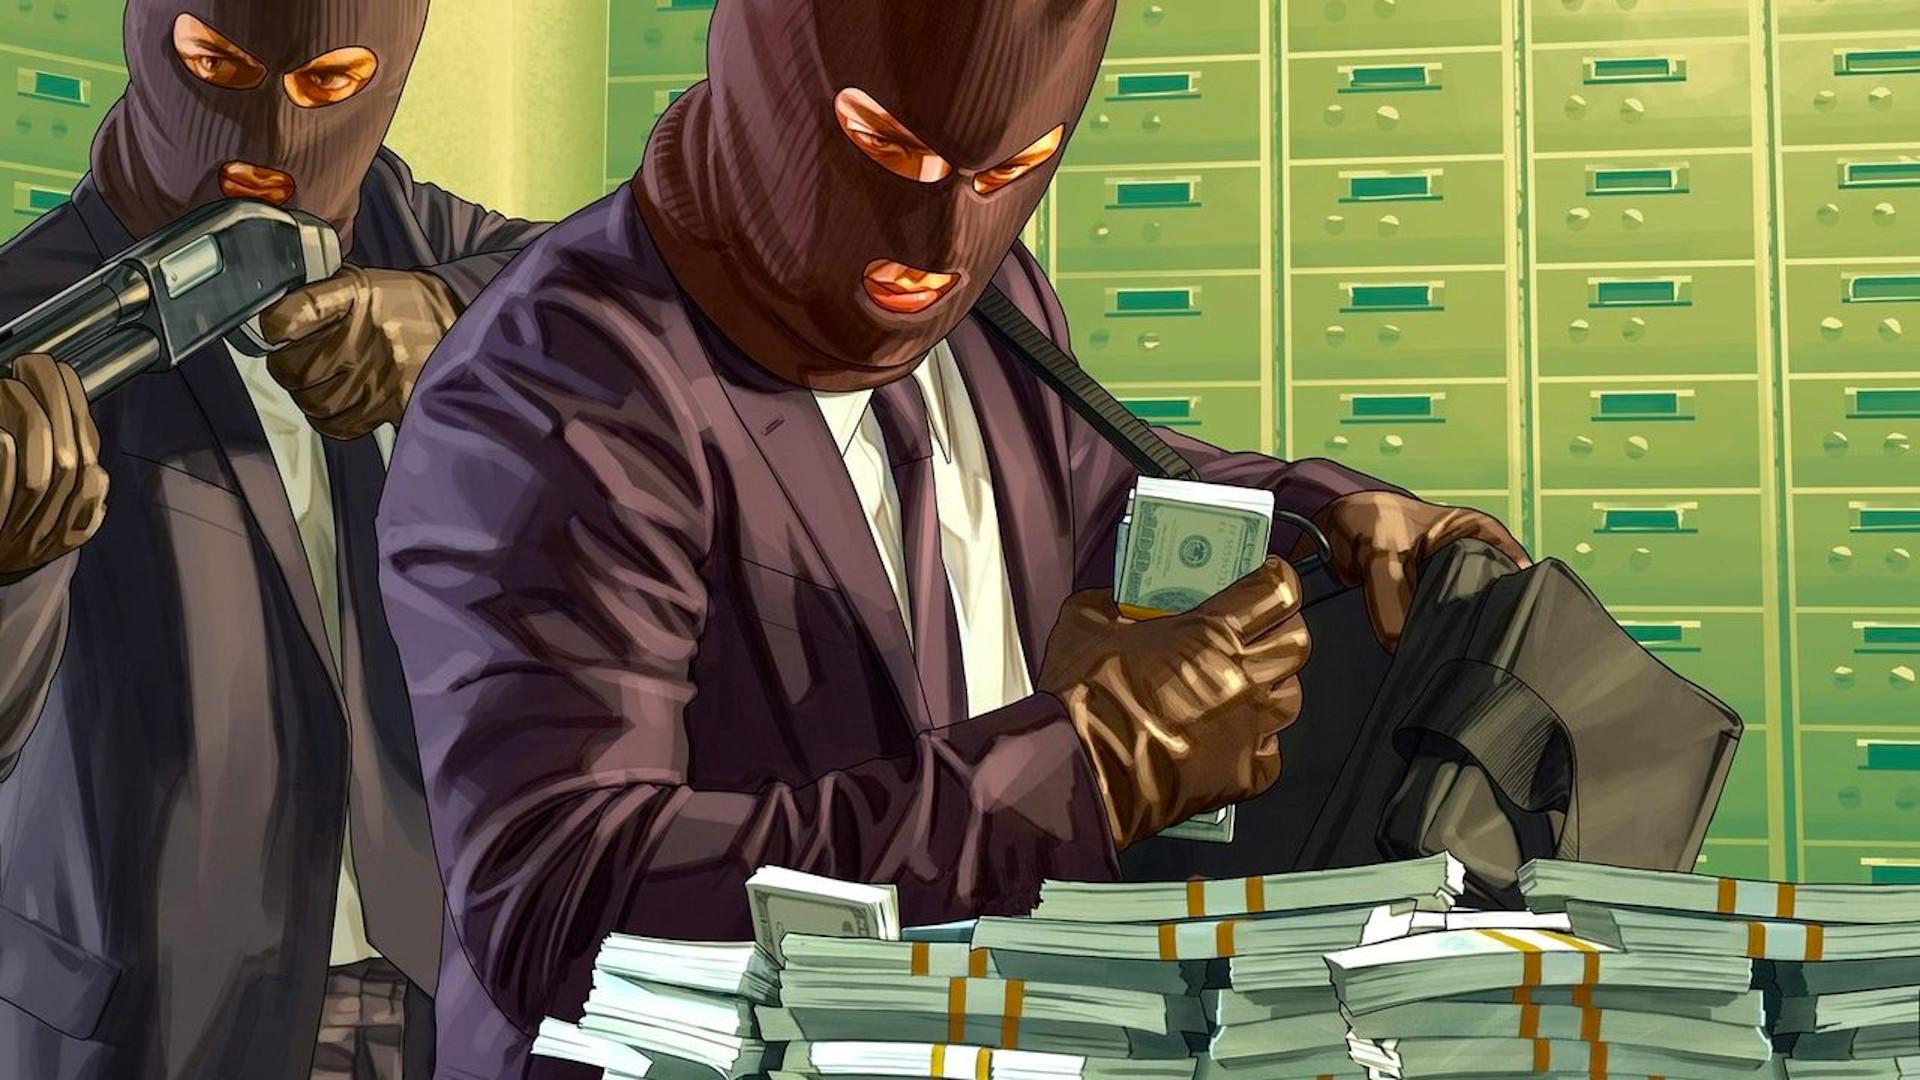 gta 5 online: heist starten – koop-raubüberfälle, die viel